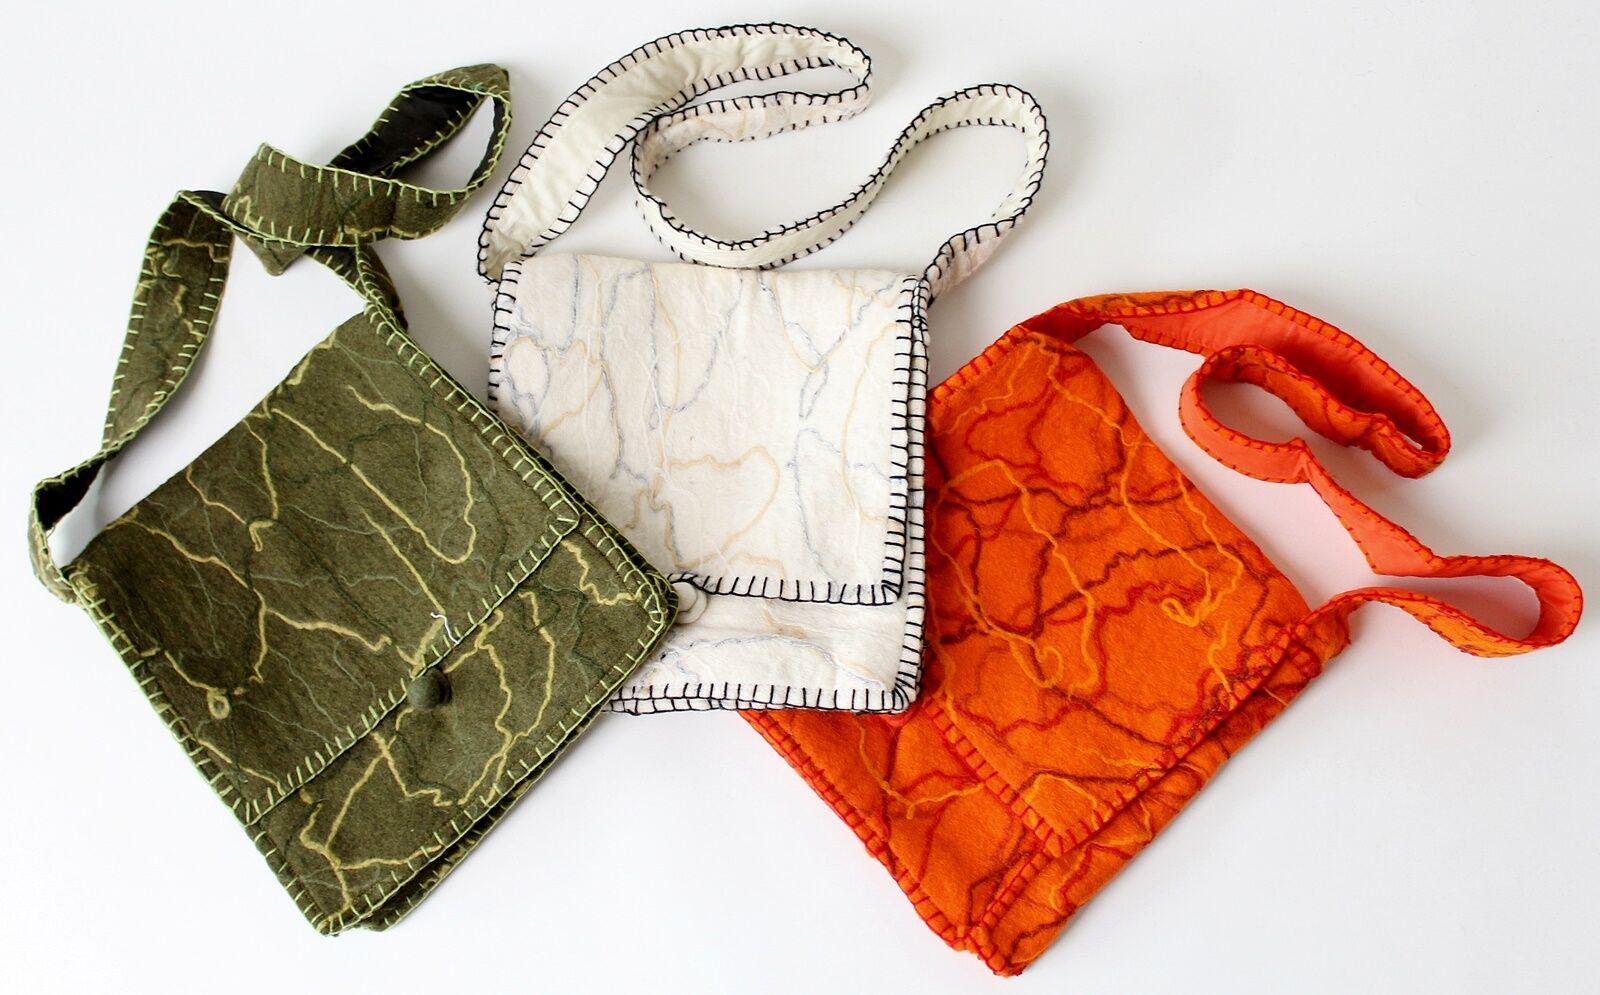 * Felt Bag from Nepal in 3 Colours dimensions: 30cm x 32cm Handmade Vintage Hippie-show original title